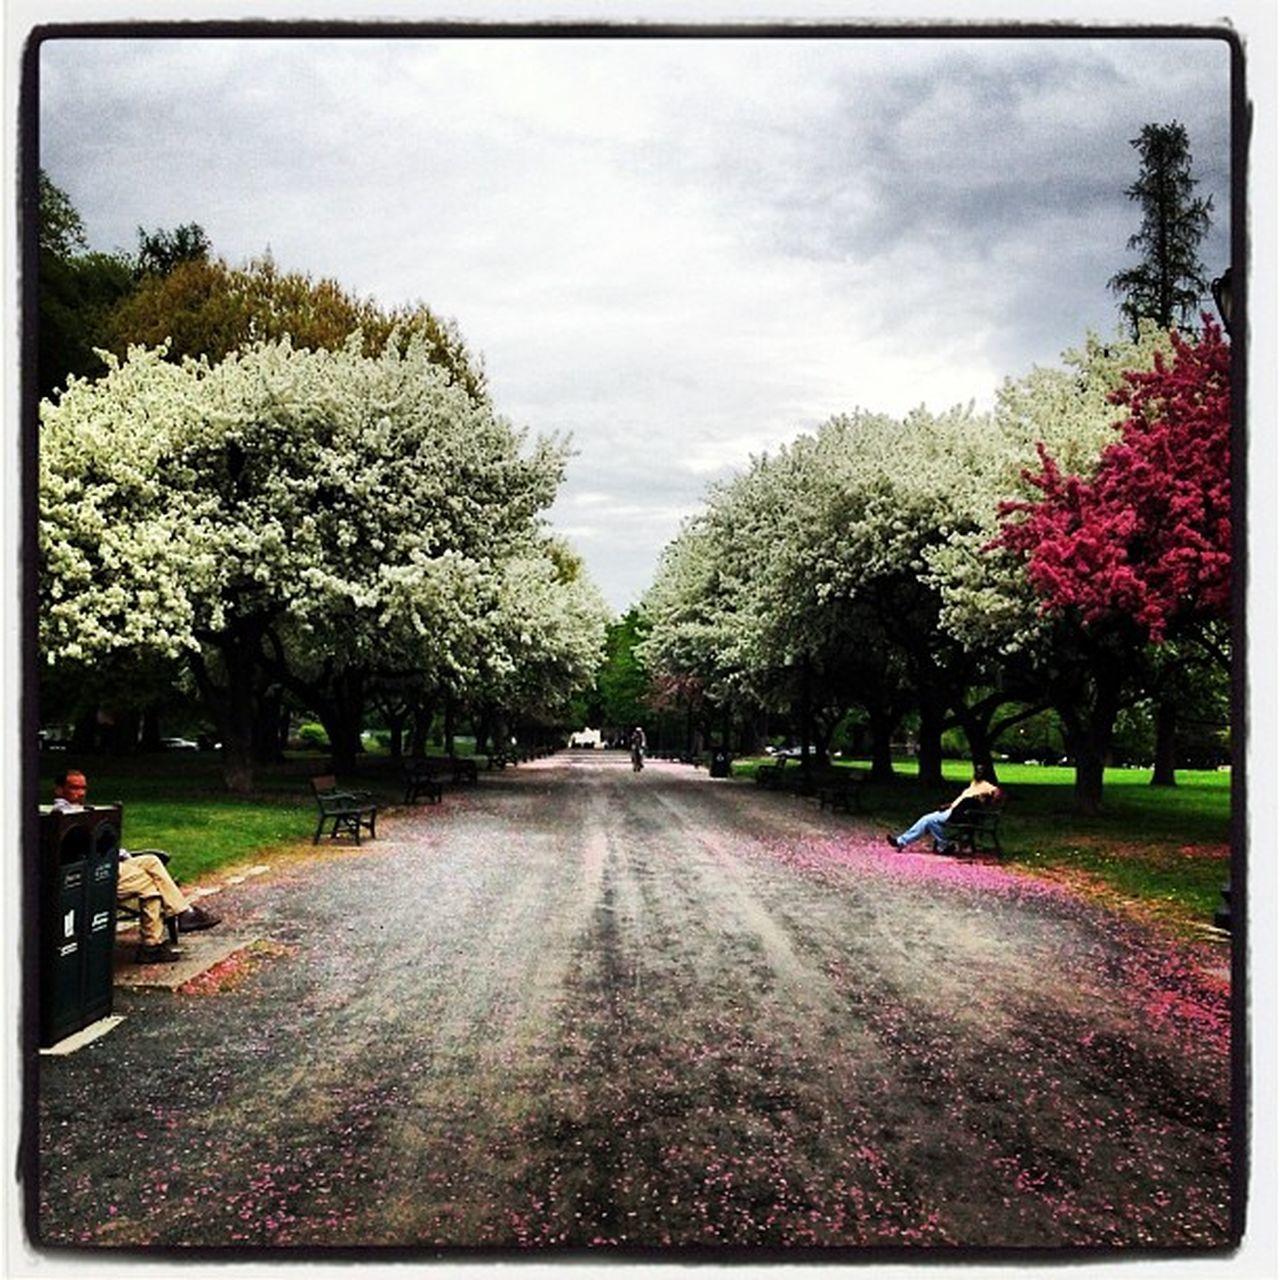 Springday Park Albany Washingtonpark newyork adayinthepark trees